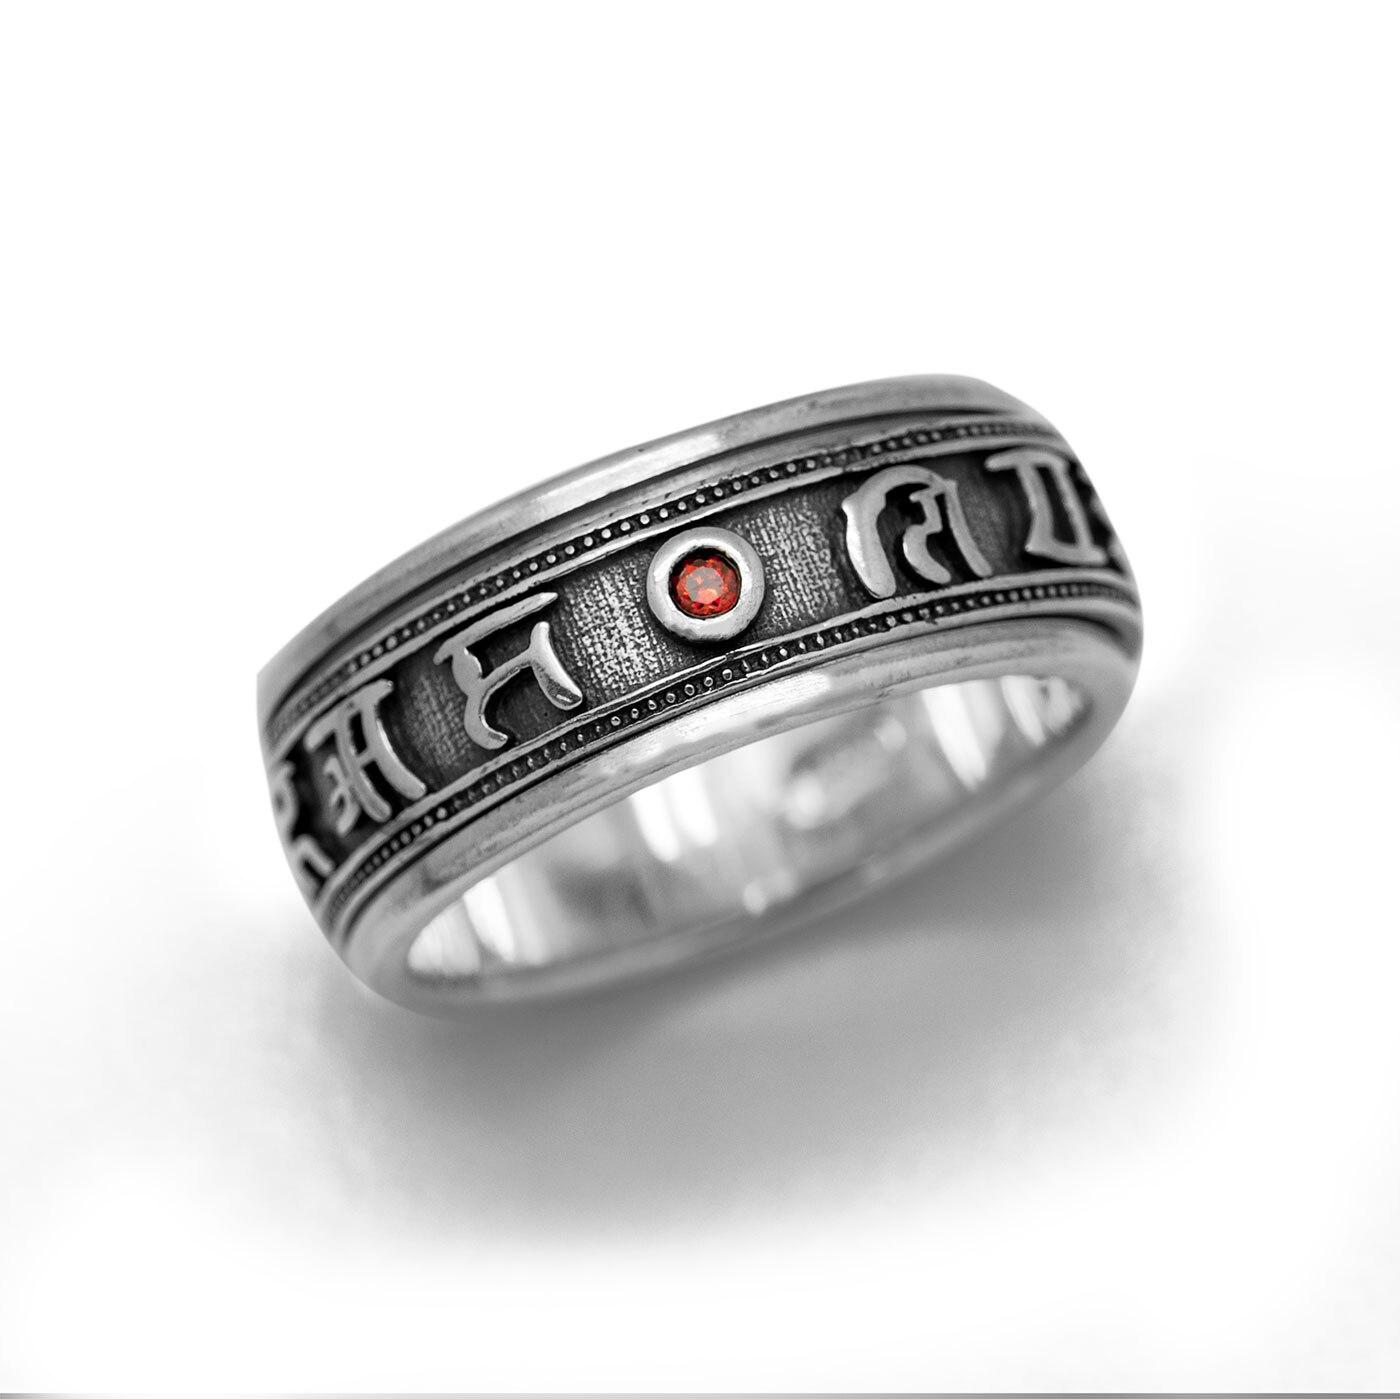 Best Of Wedding Ring Blessing – Wedding